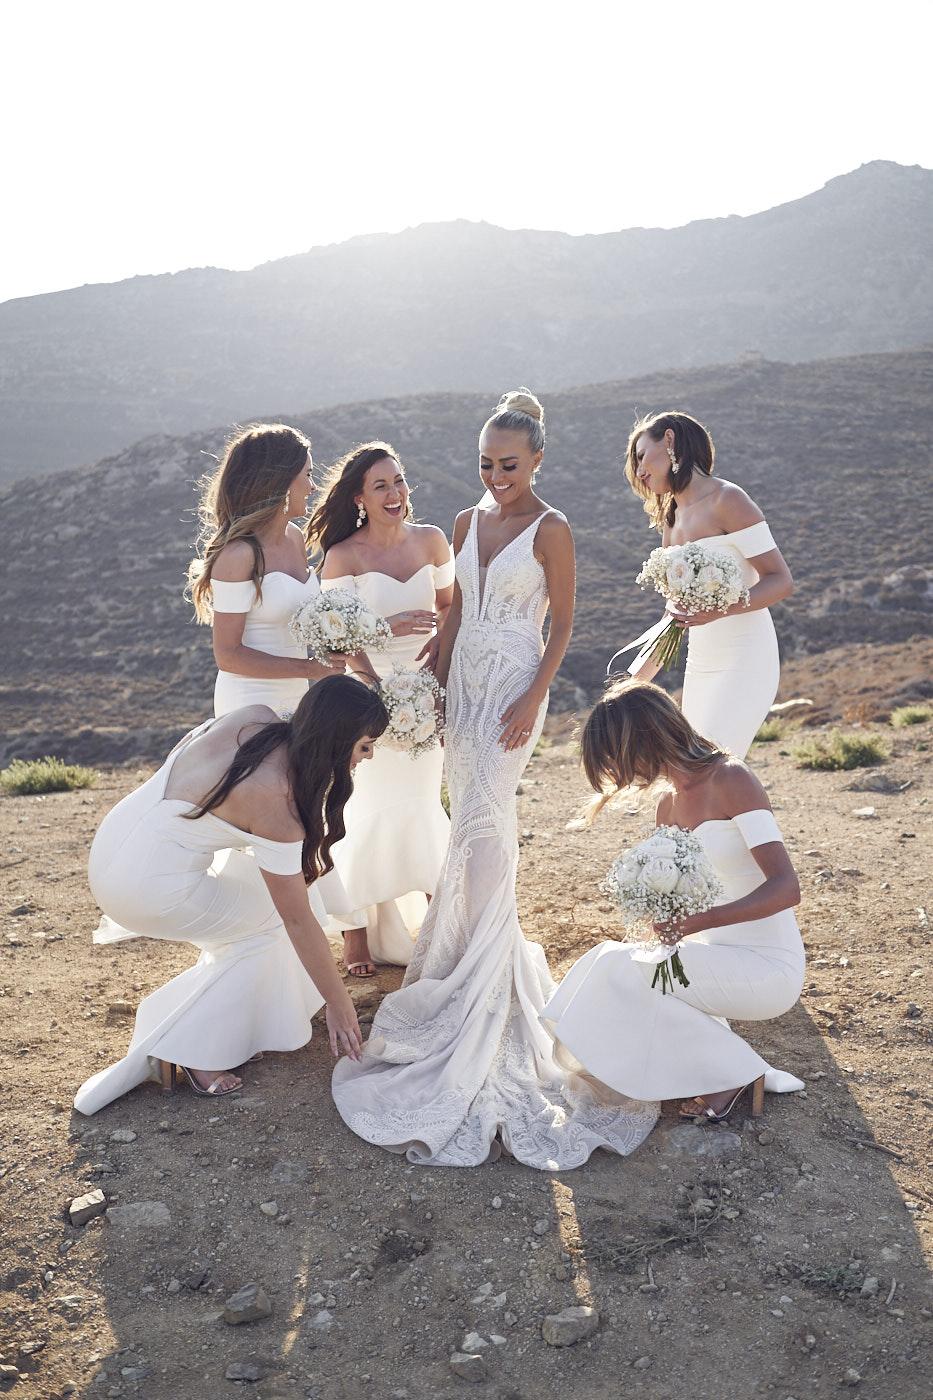 MandN_Mykonos-wedding_Lostinlove 12.JPG